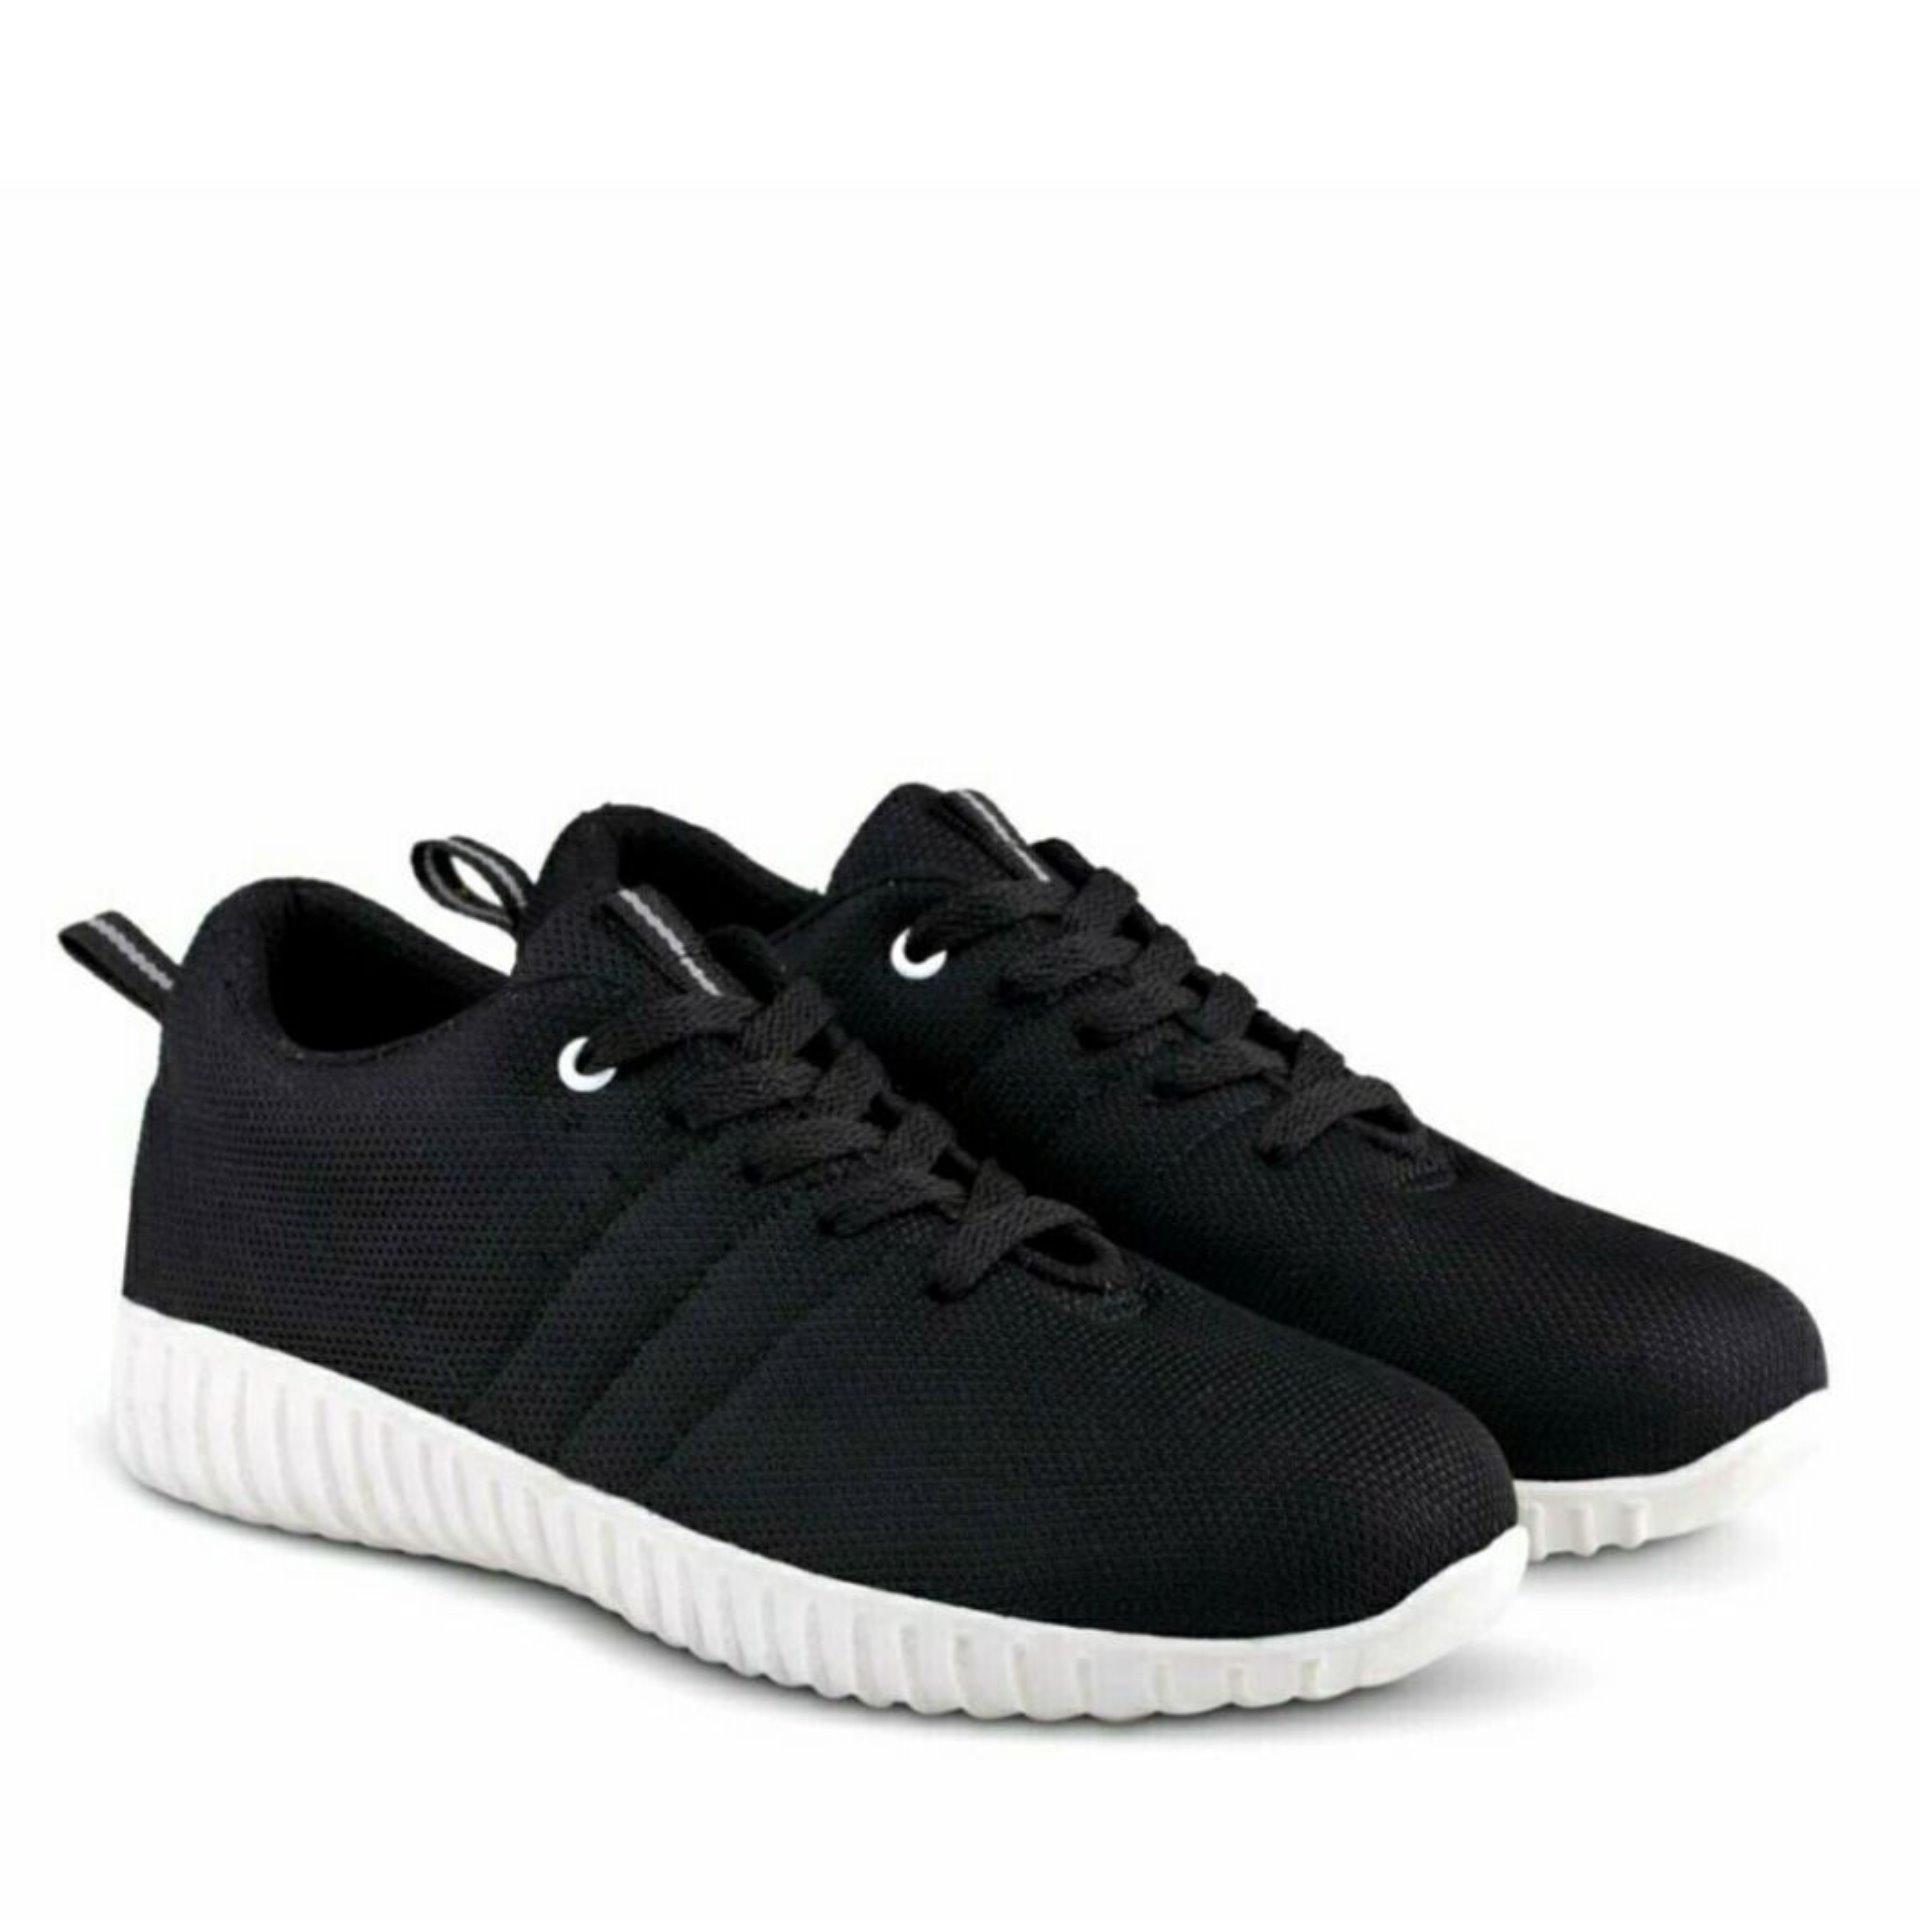 Adinova Shoes Sepatu Sport Adinio  Sepatu Olahraga   Sepatu Gaya Adinio   Sepatu Santai  3cadff6f93